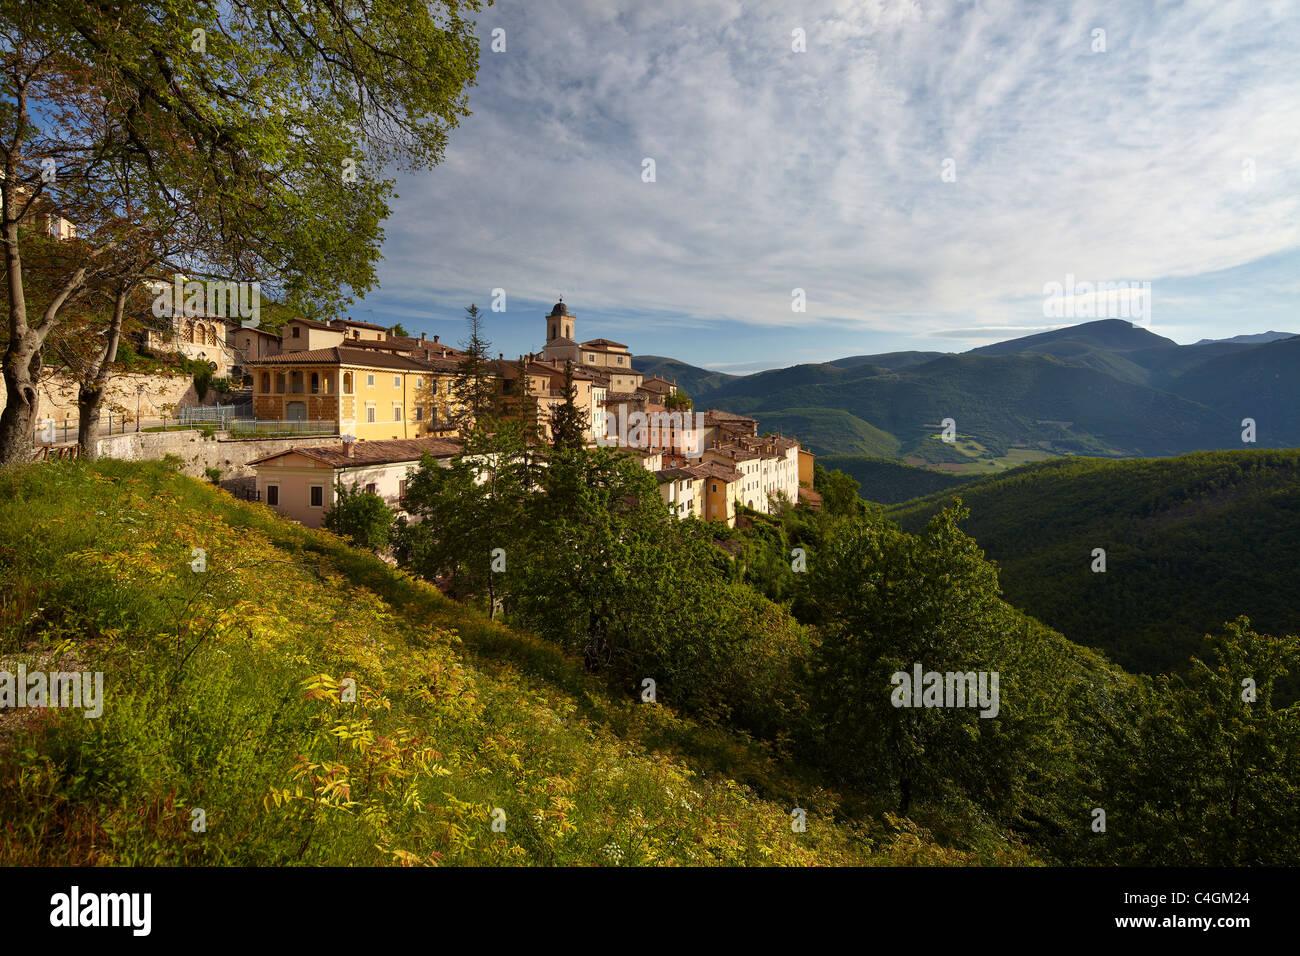 Abetto in the Valnerina, Monti Sibillini National Park, Umbria, Italy Stock Photo